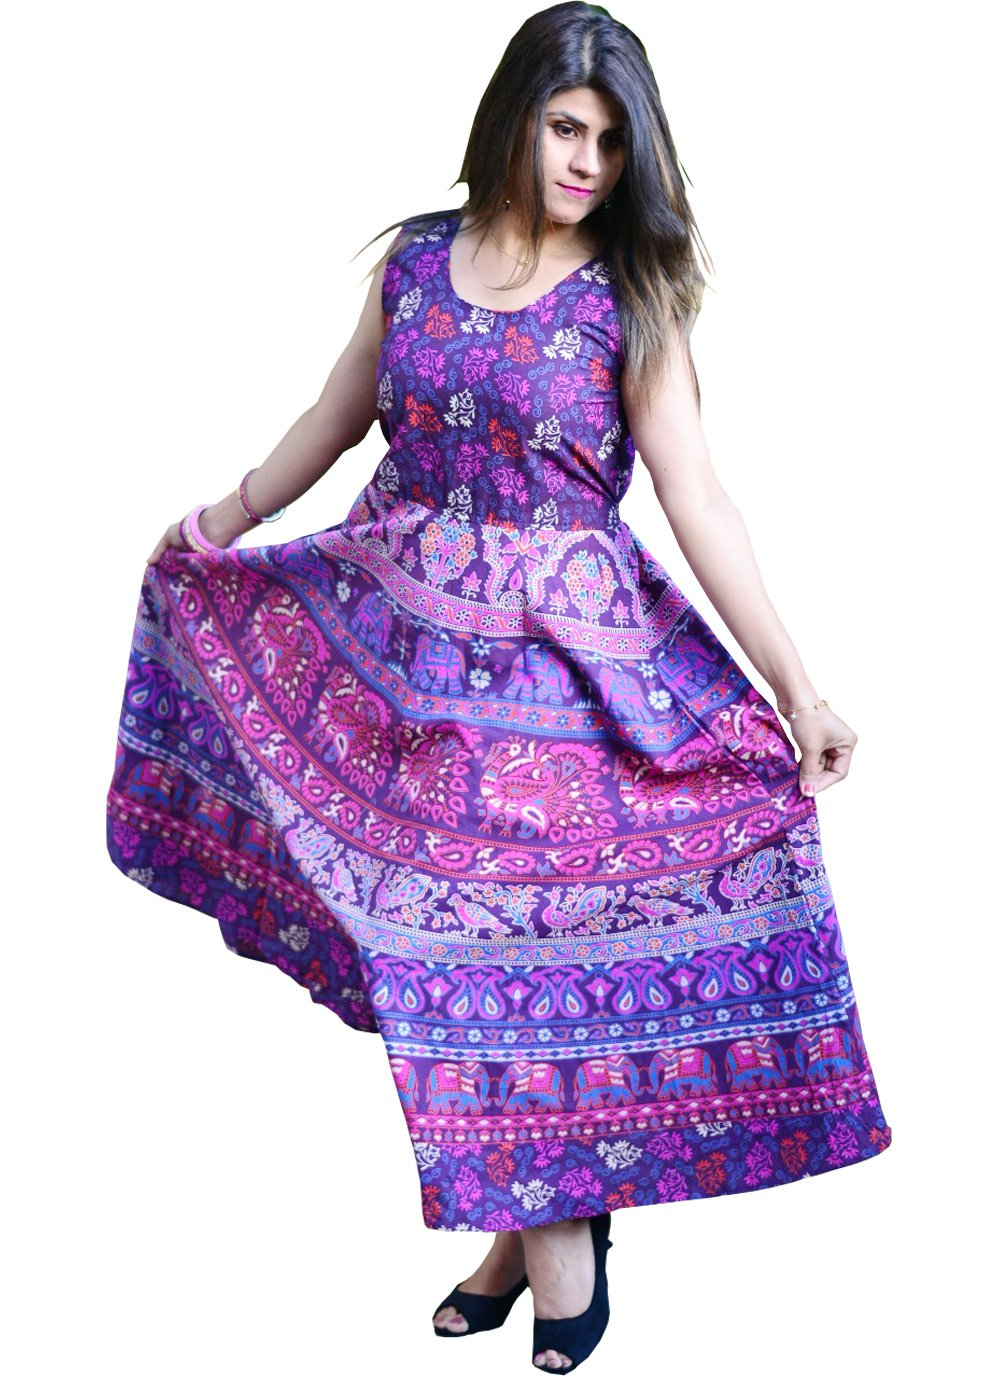 Nature Print Handmade Maxi Dress